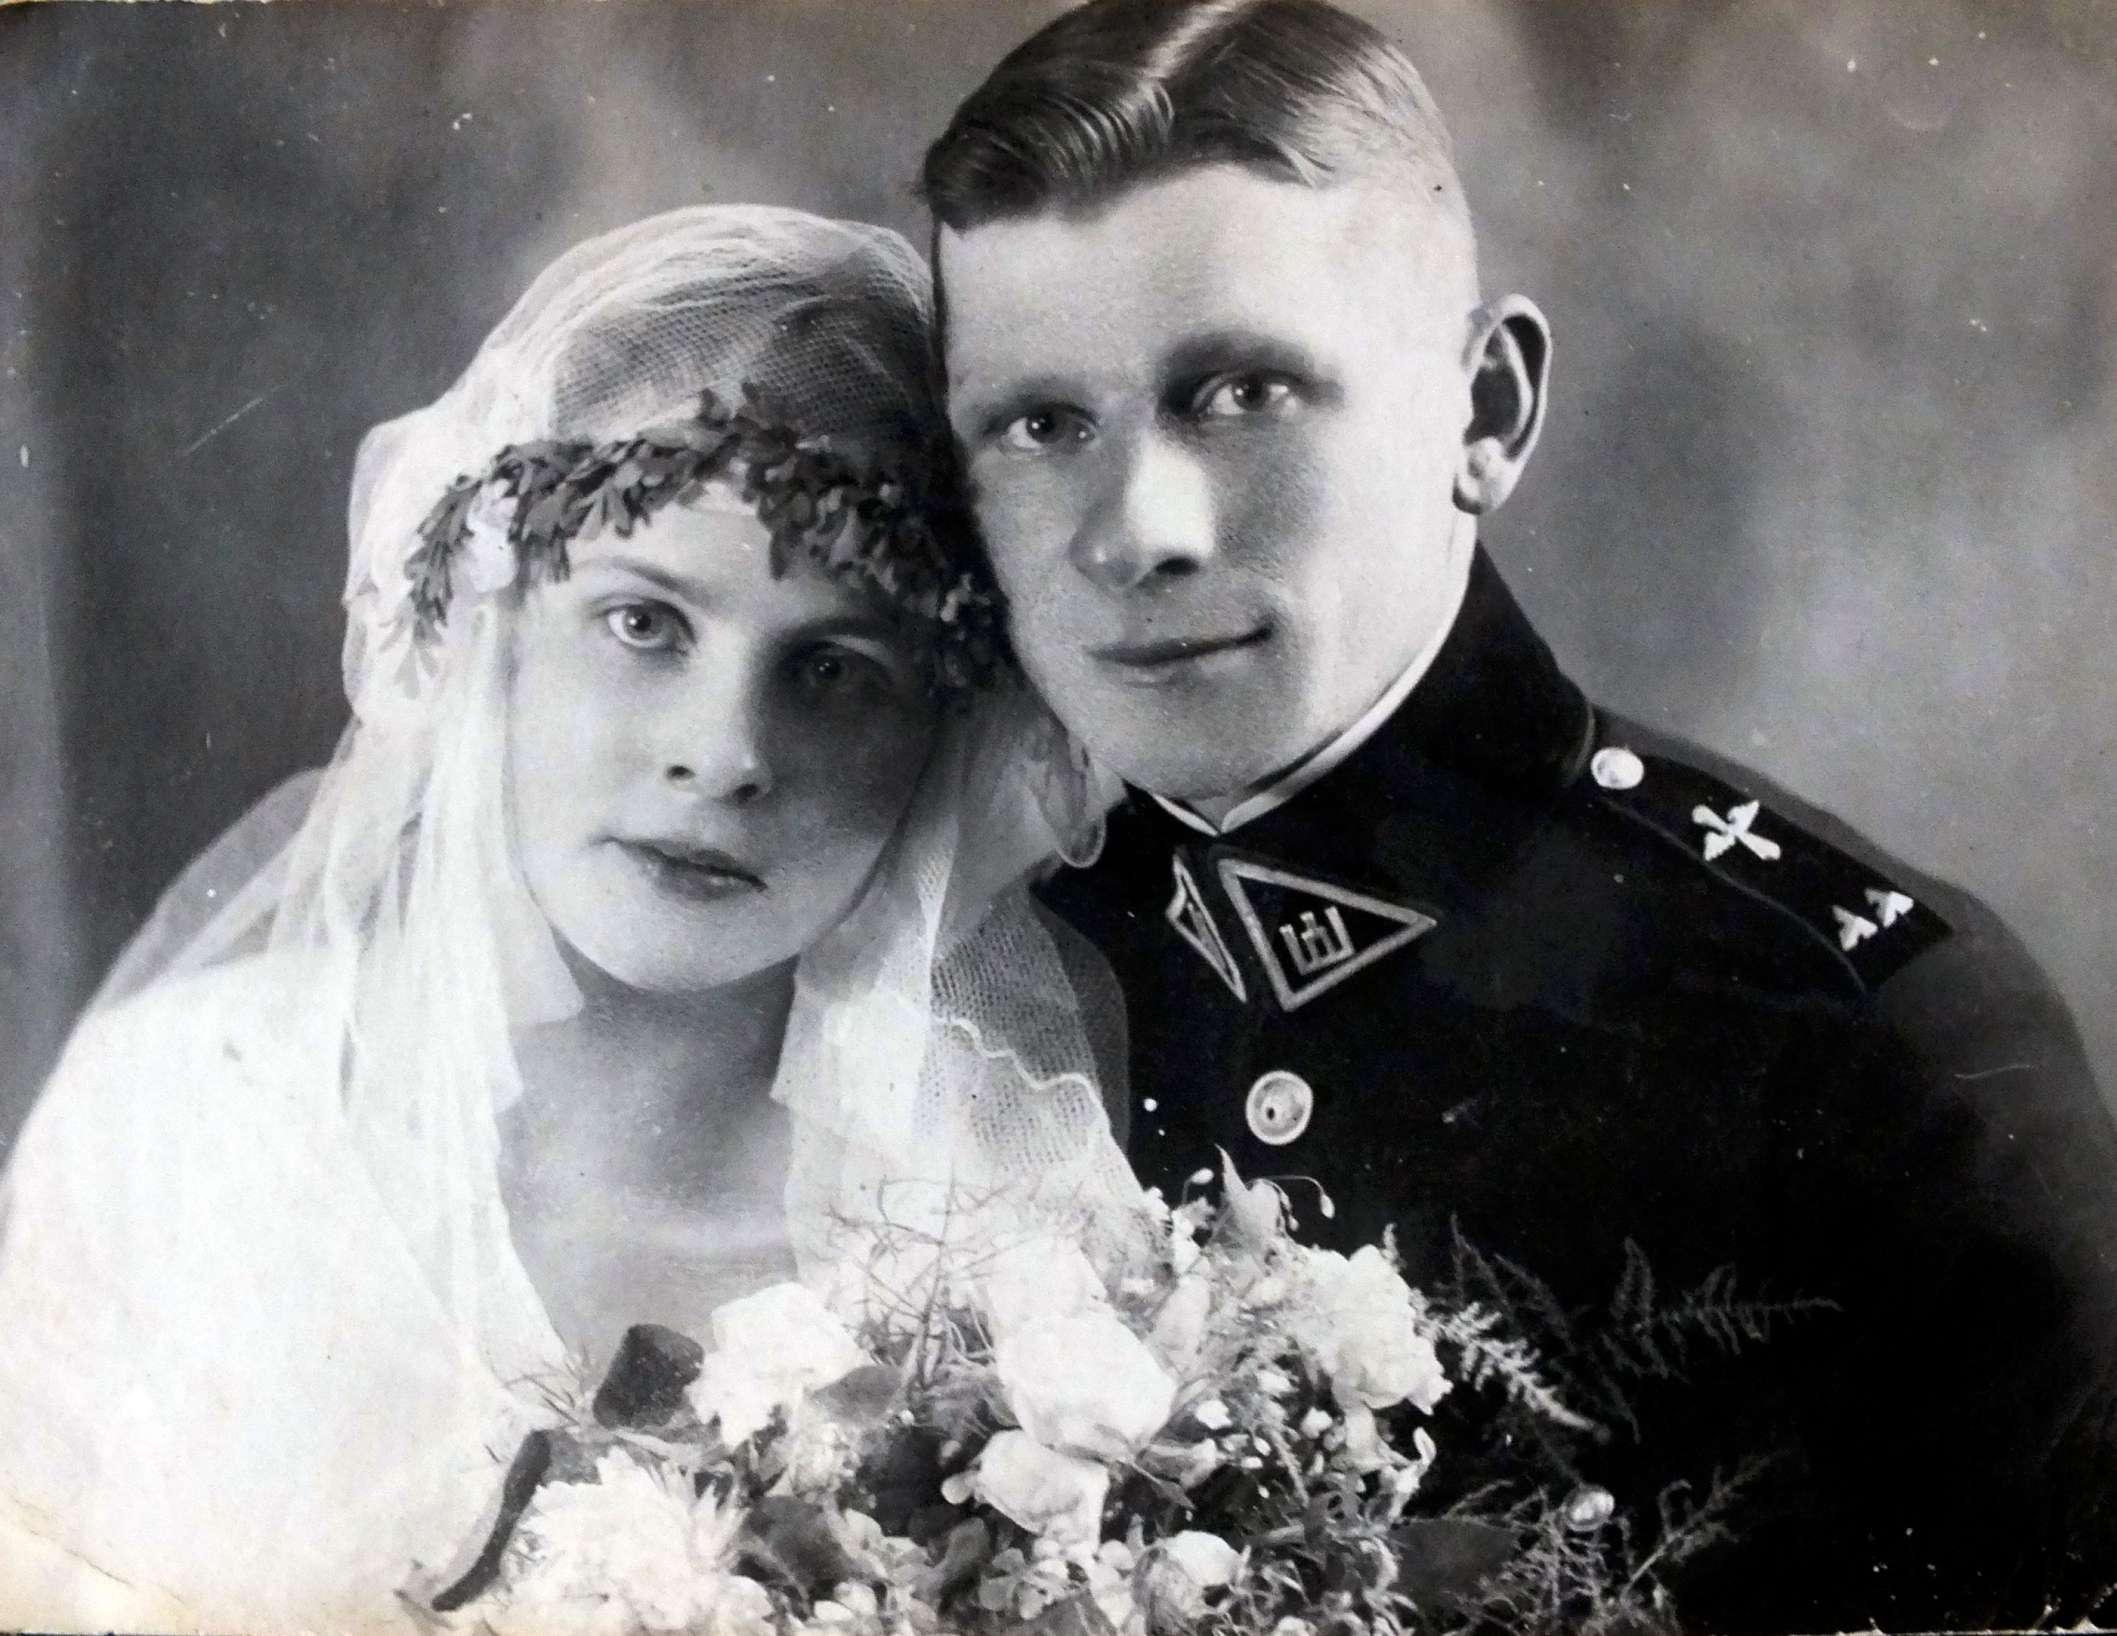 Adolfo Žygo ir Nadieždos Černojavskajos (Černiauskaitė) vestuvės, 1928 m. | V. Žygas asmeninė nuotr.